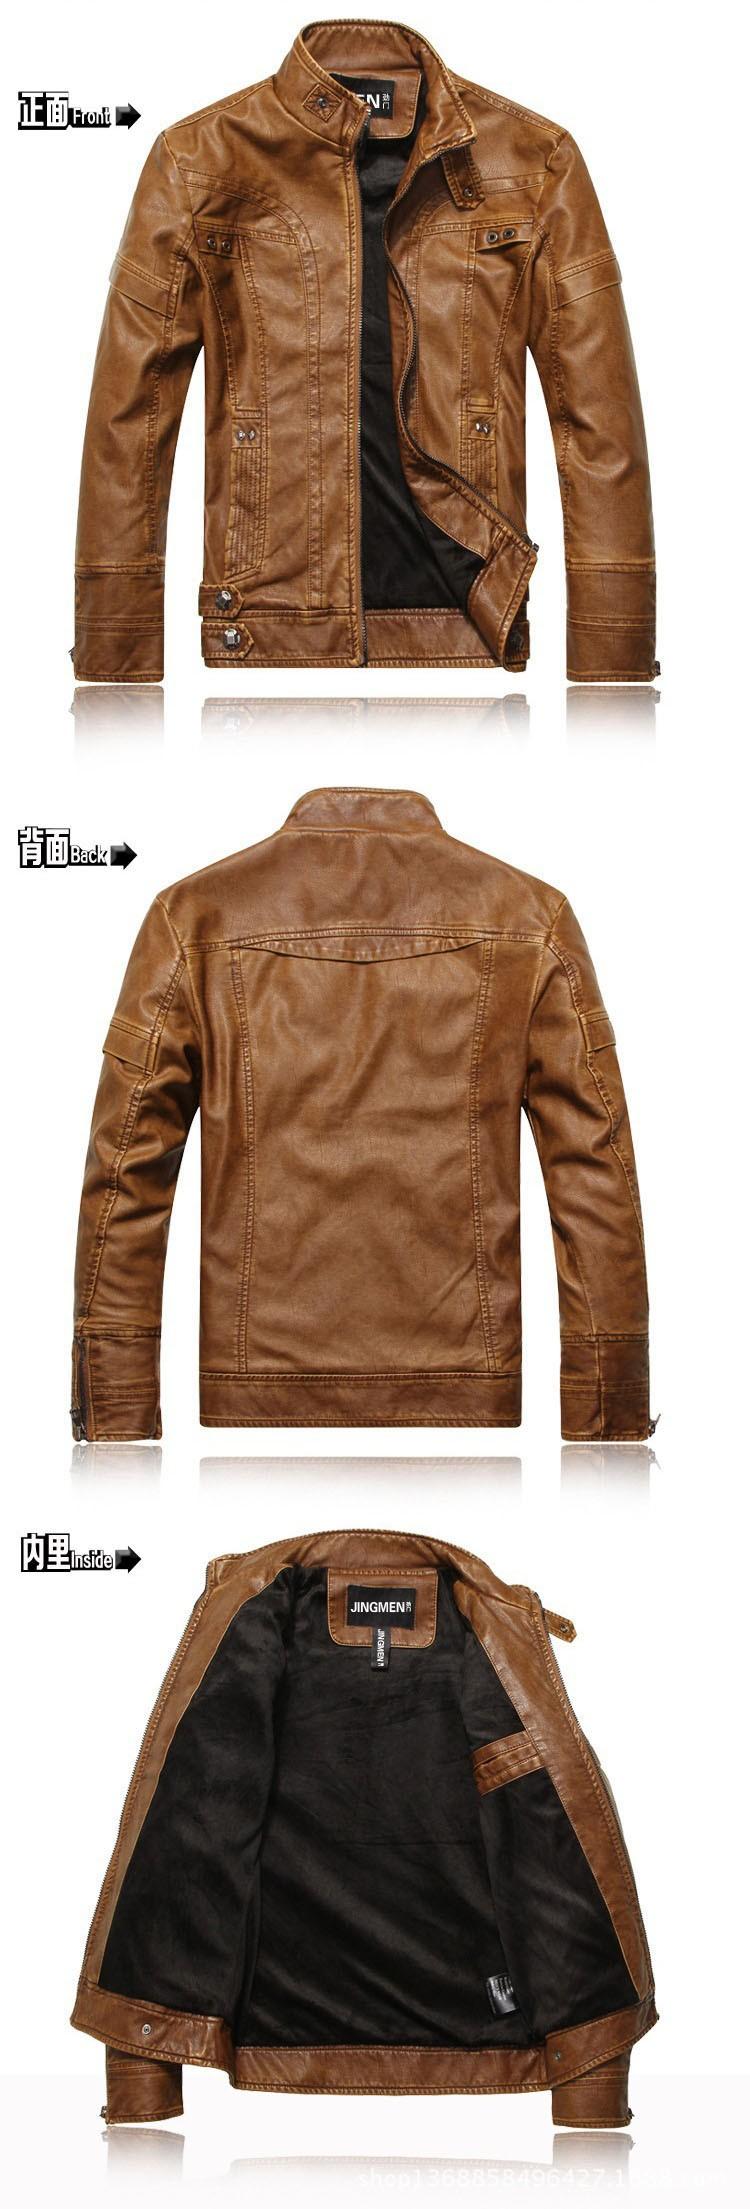 PU Leather Jacket Men 2016 Fall Winter Fashion Faux Fur Bomber Motercycle Biker Jacket High Quality Plus Velvet Casual Outwear (7)